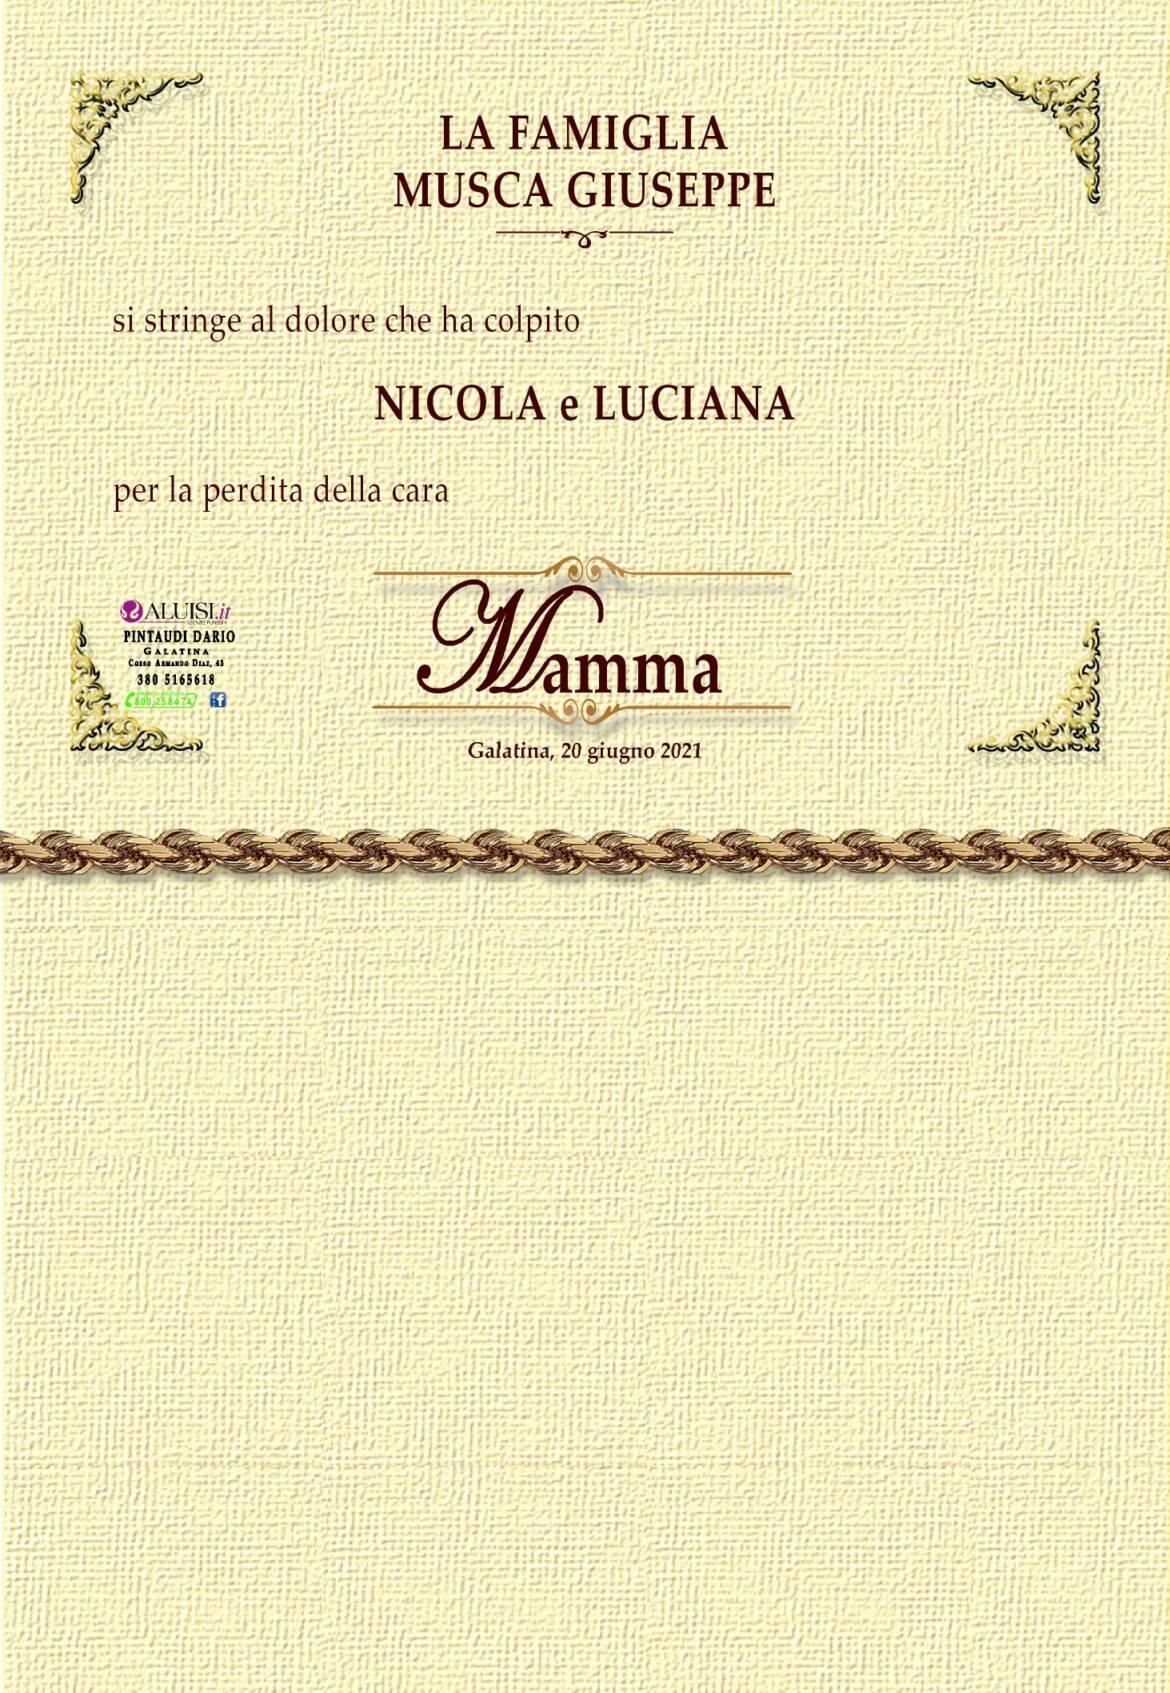 PARTECIPAIZONI-ANNA-MARIA-MARRA-GALATINA-1.jpg